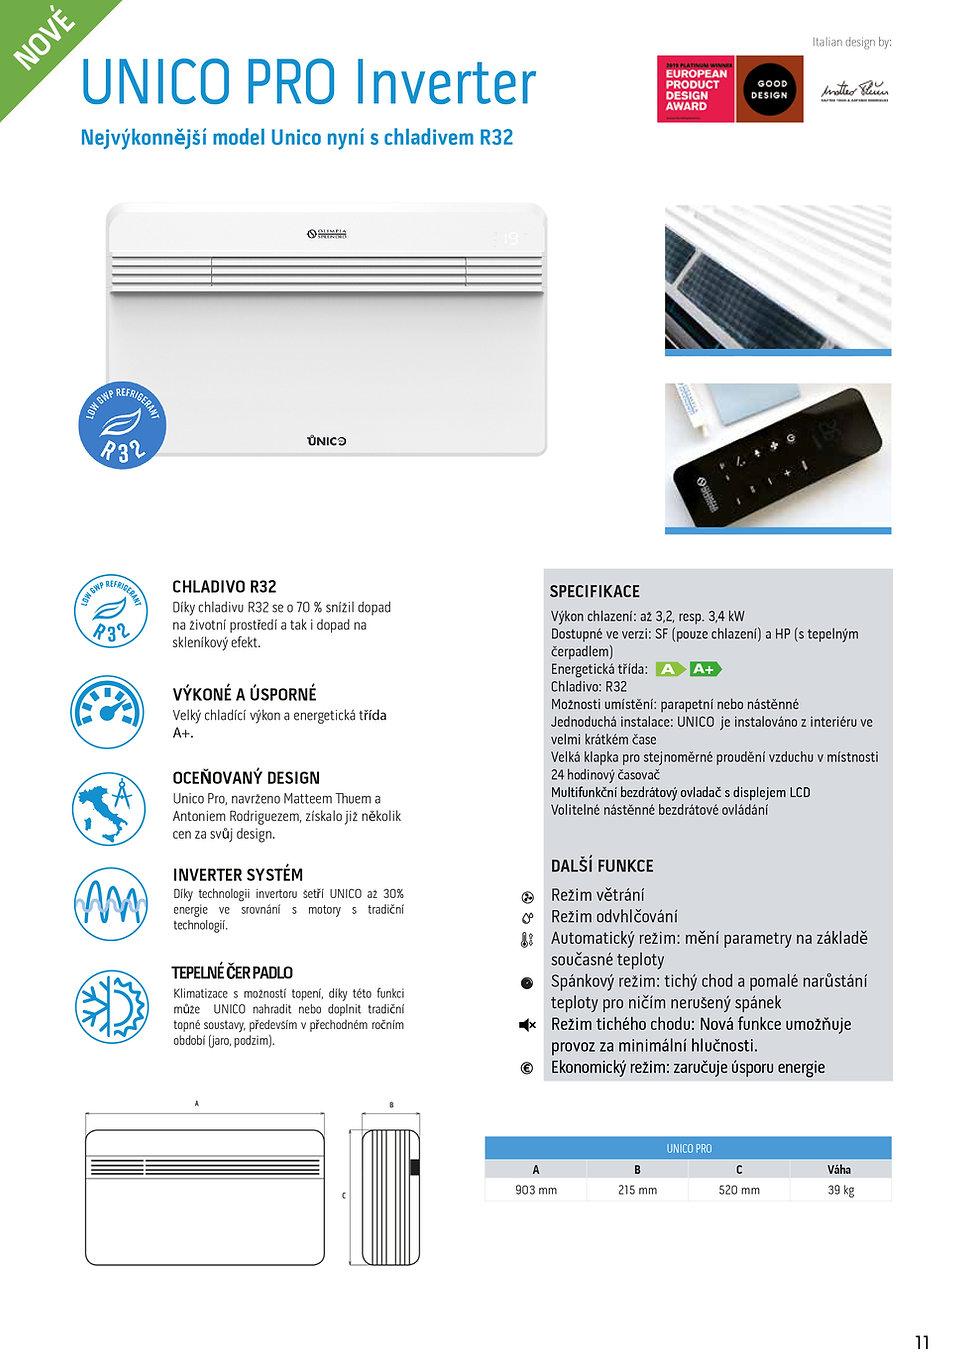 Katalog Unico 2021 Tradesam-13.jpg